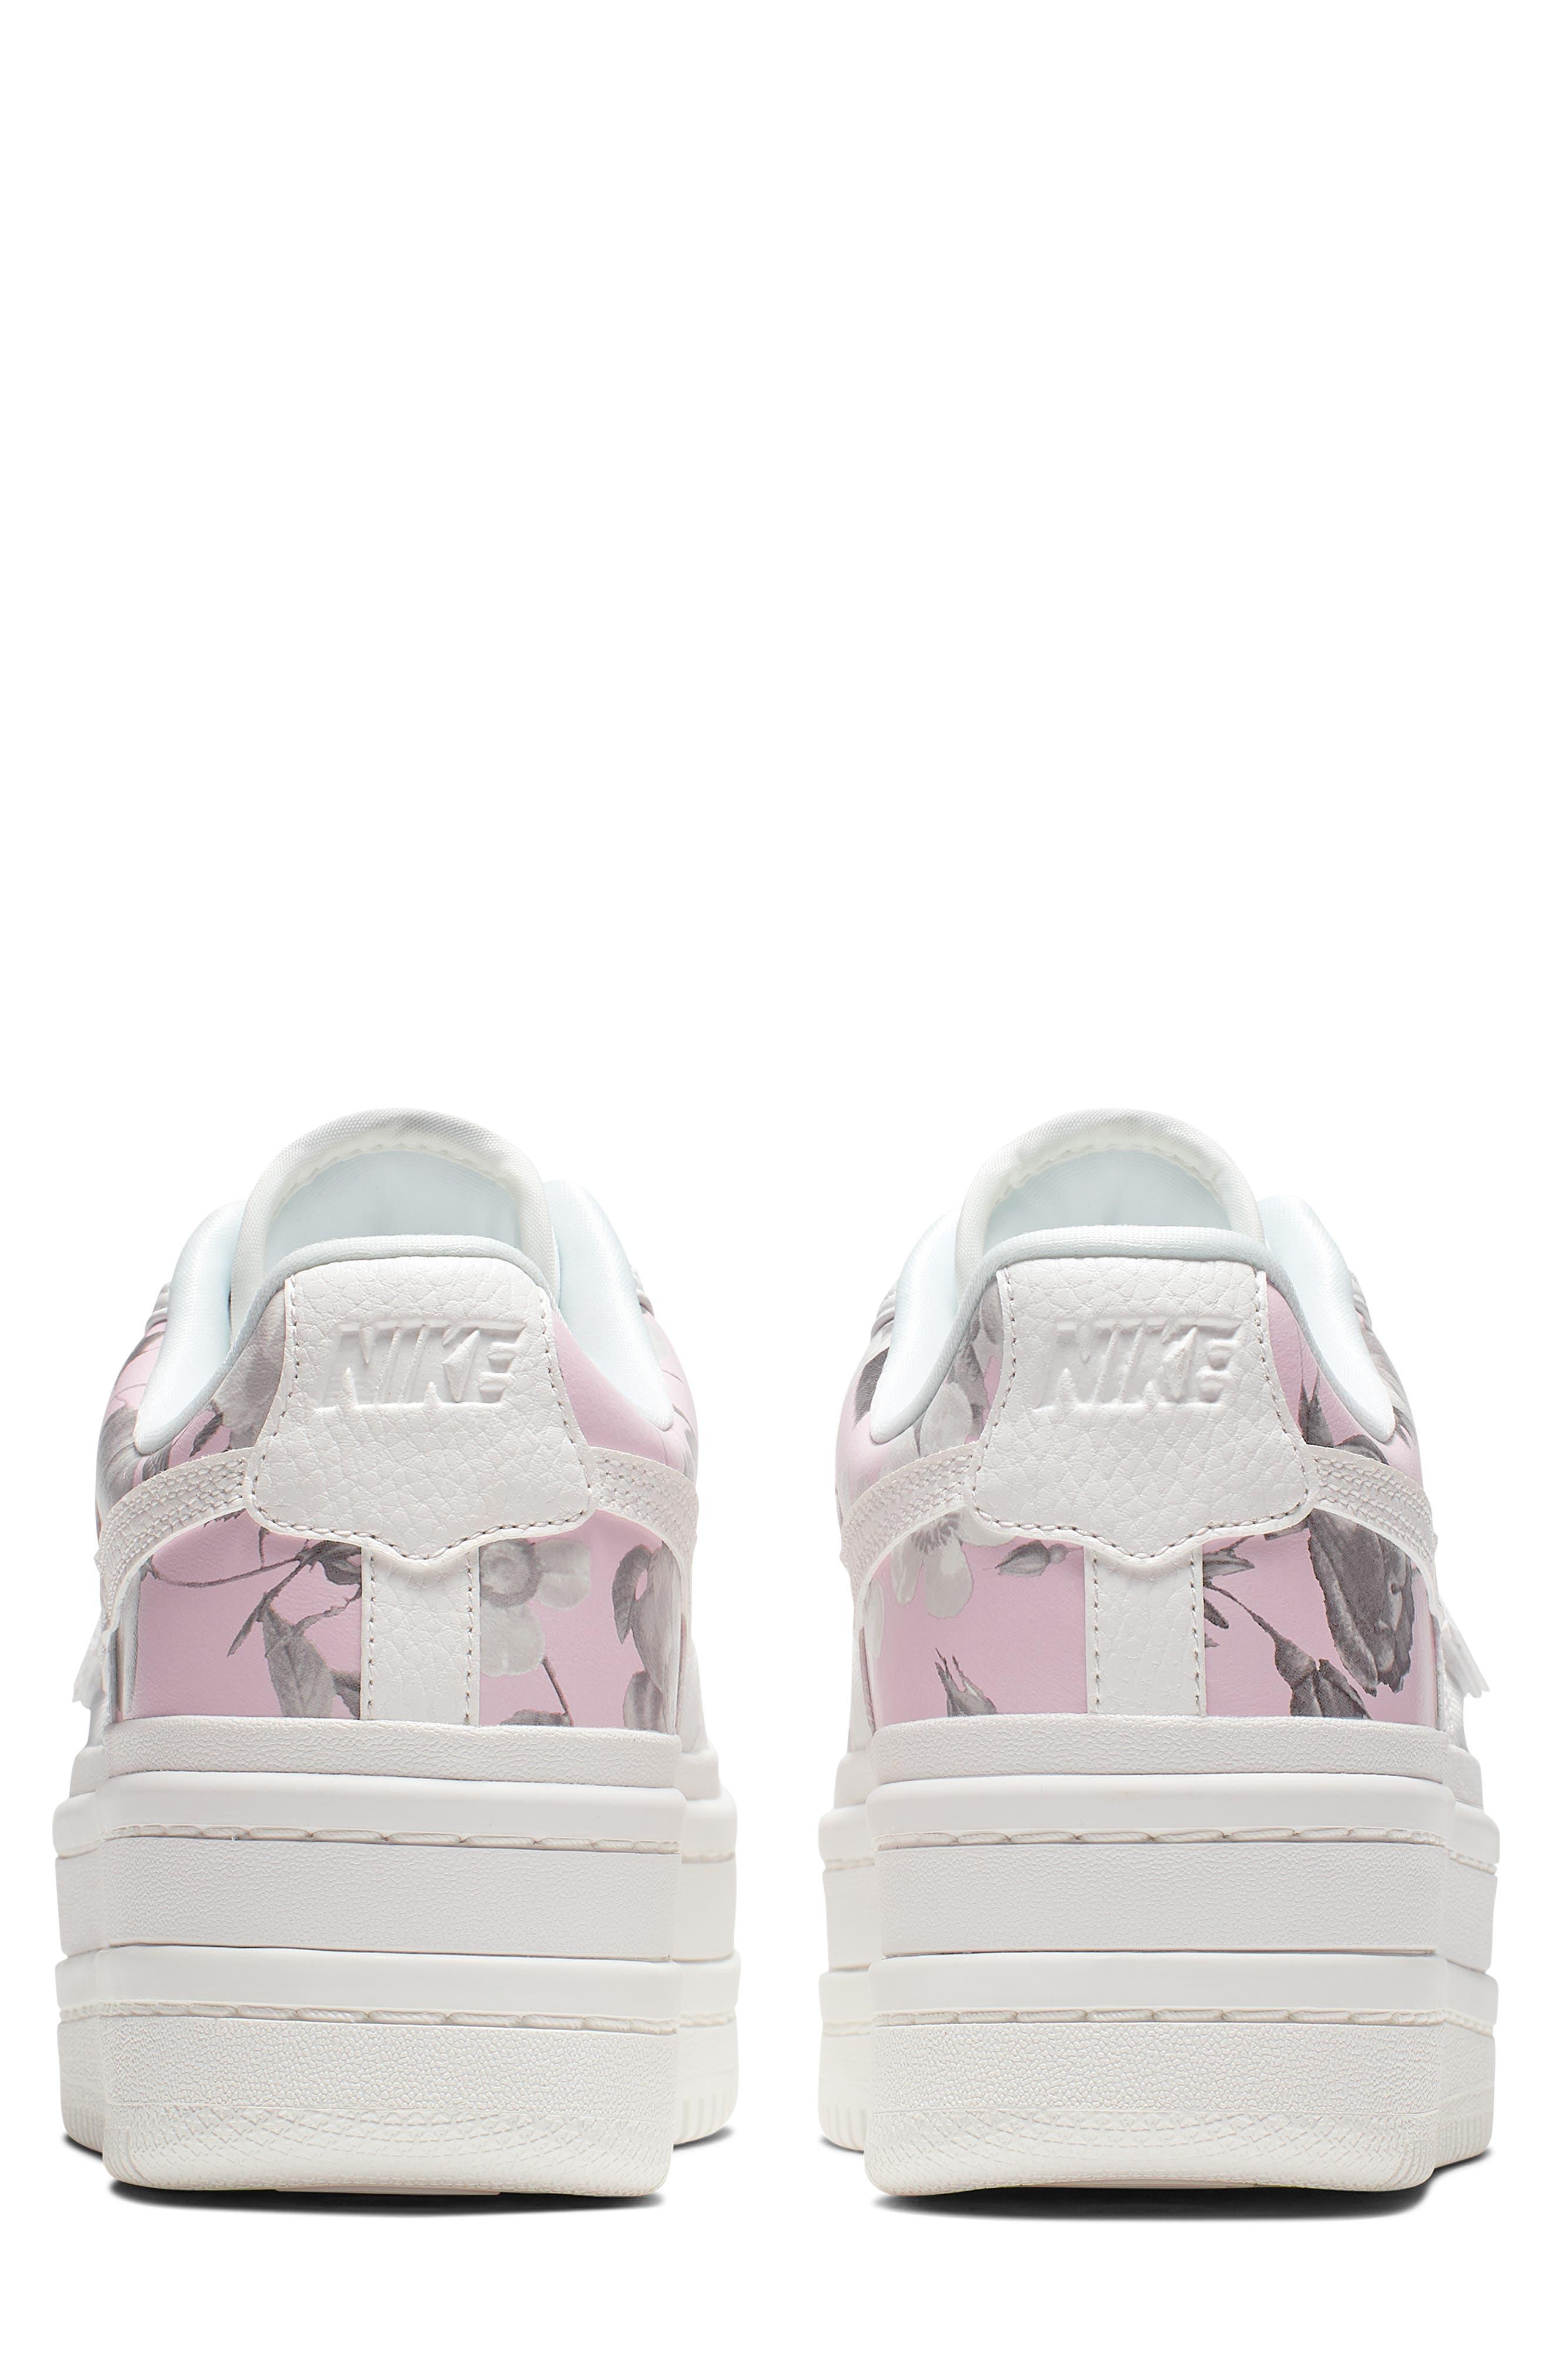 NIKE,                             Vandal 2K LX Platform Sneaker,                             Alternate thumbnail 2, color,                             WHITE/ WHITE/ BLACK